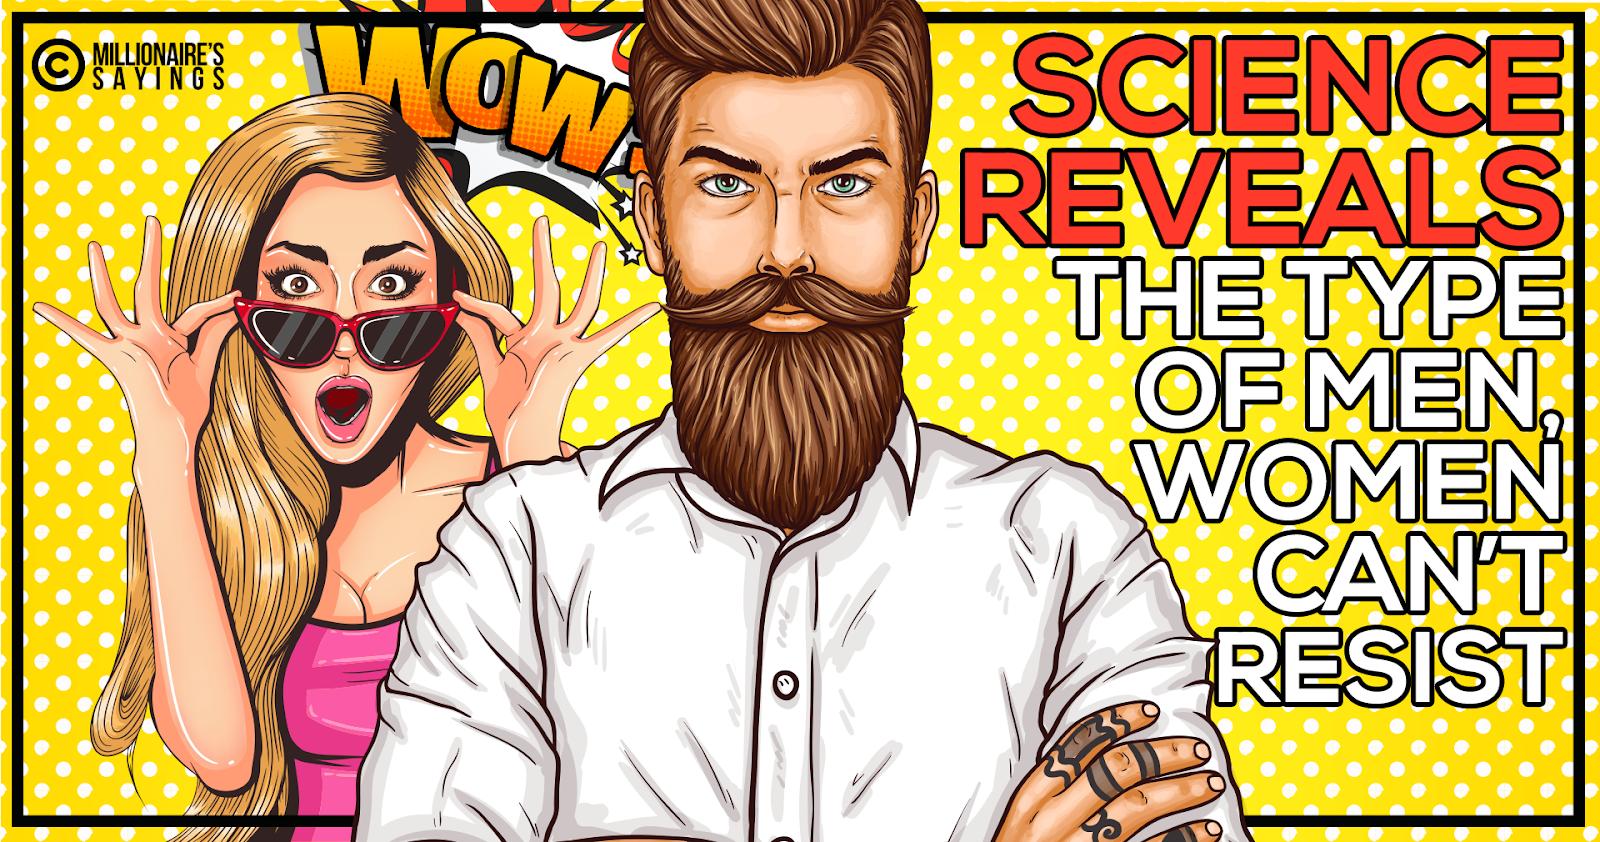 Science reveals the type ofmen women can't resist